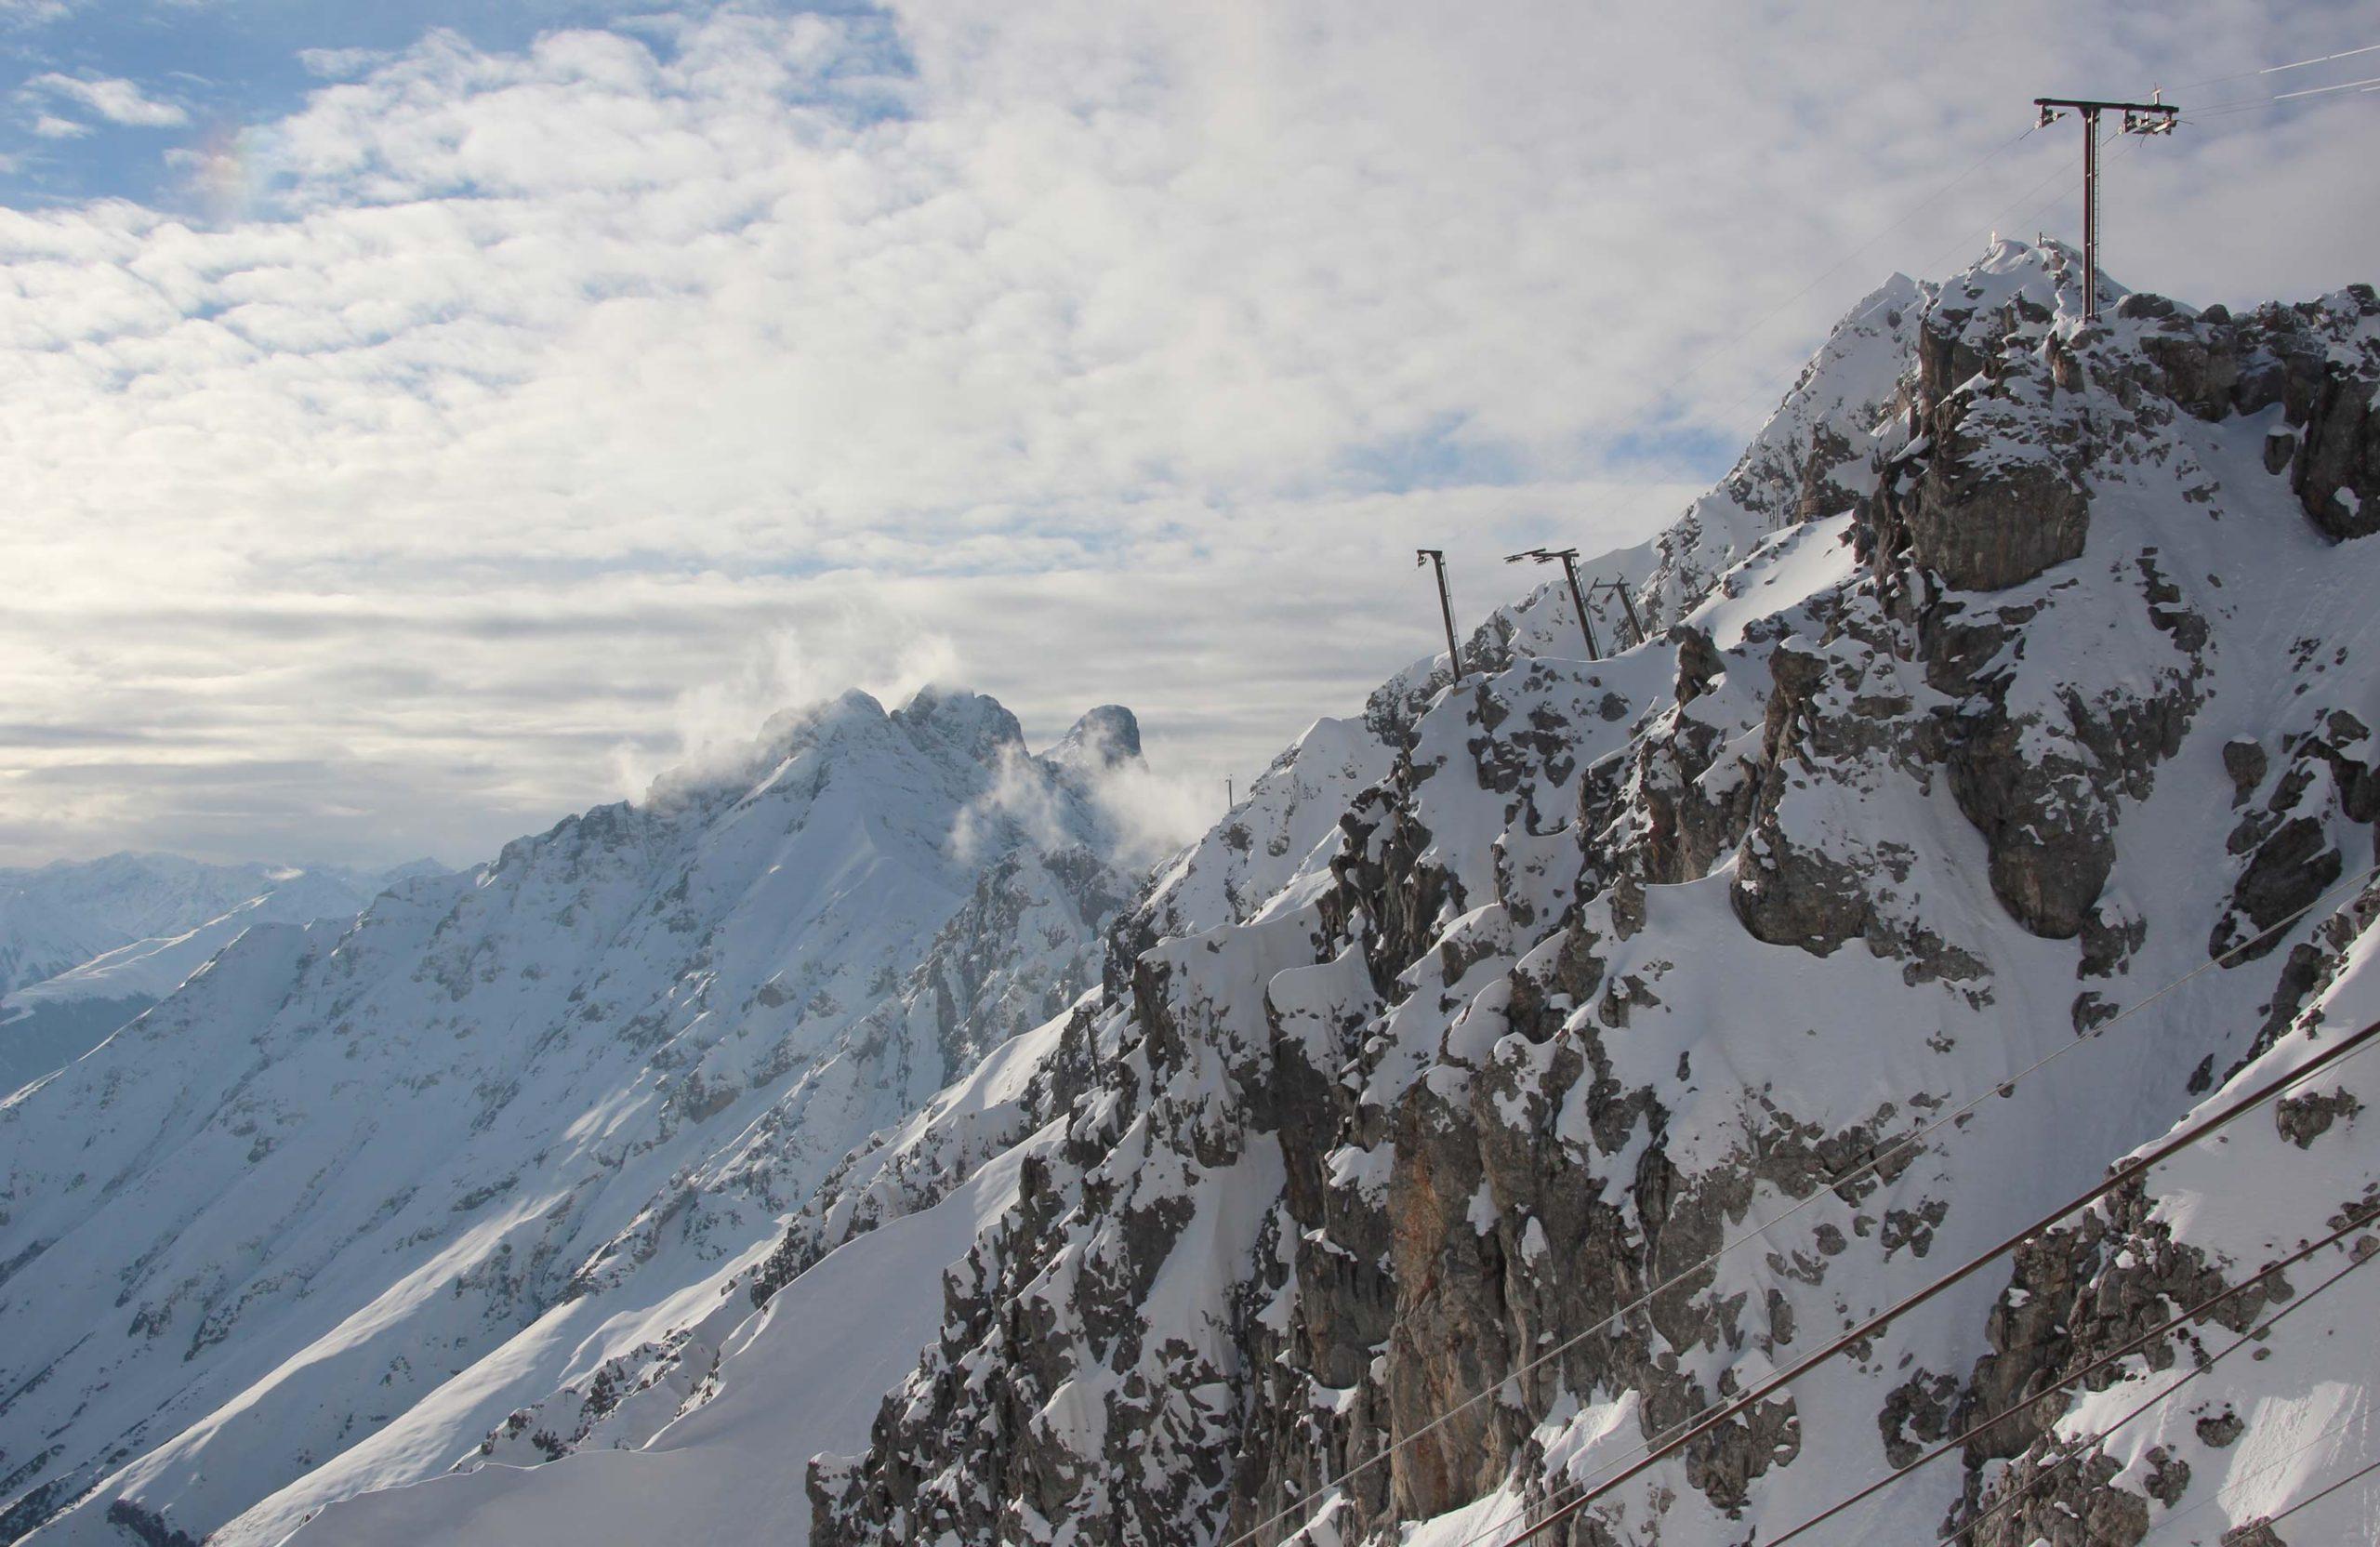 Riedz_Absteige_Apartments_Innsbruck_Tirol_Austria_Alps_Holiday_Sports_Accommodation04_WEB_2013